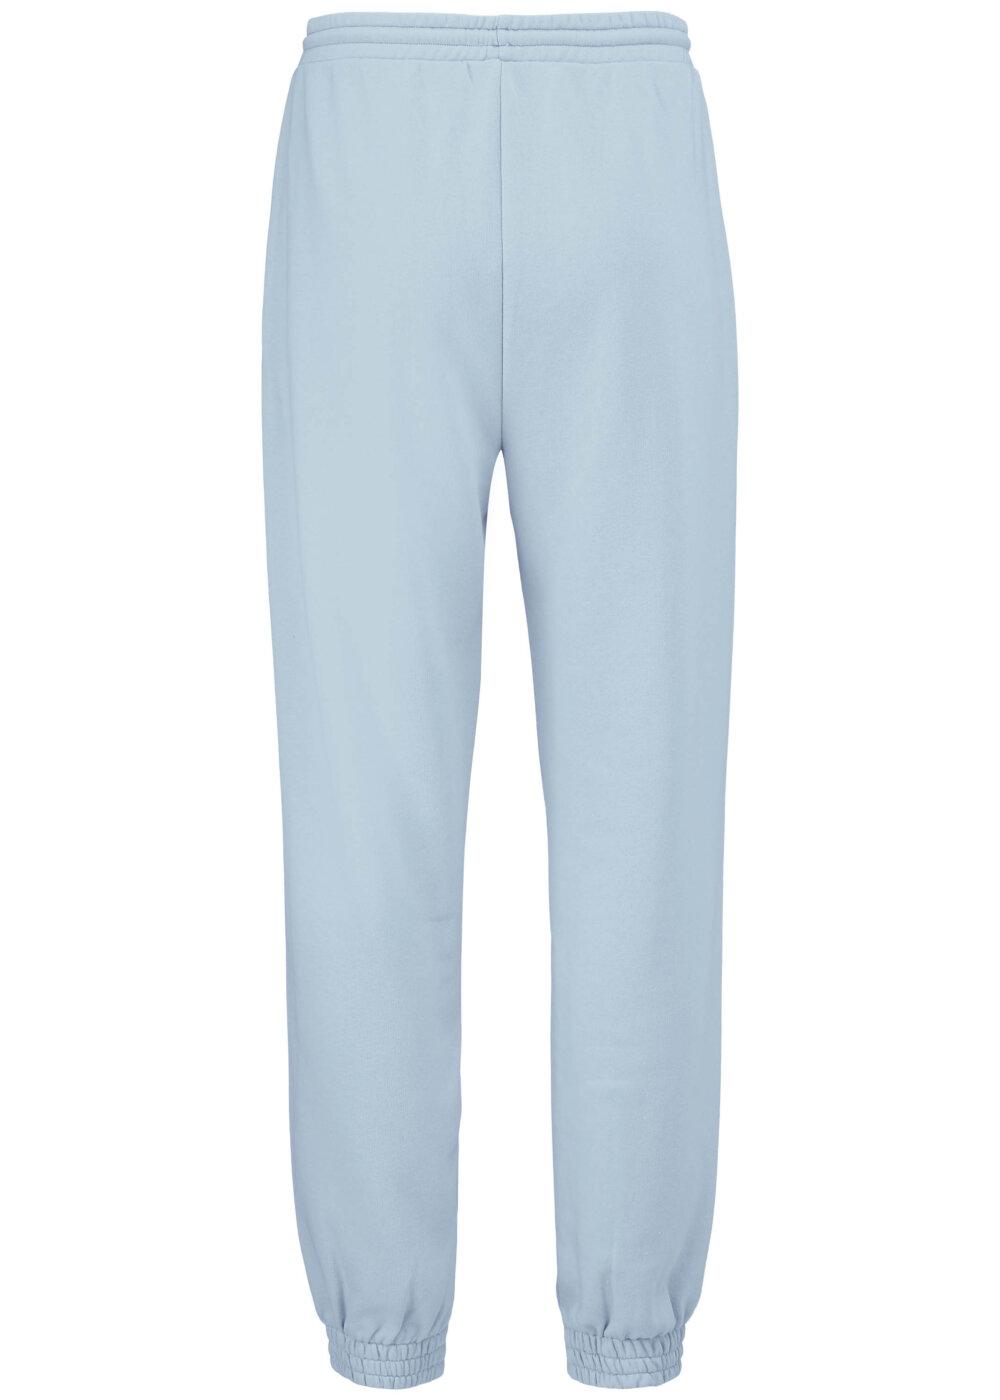 Modström Holly sweatpants, spring blue, large